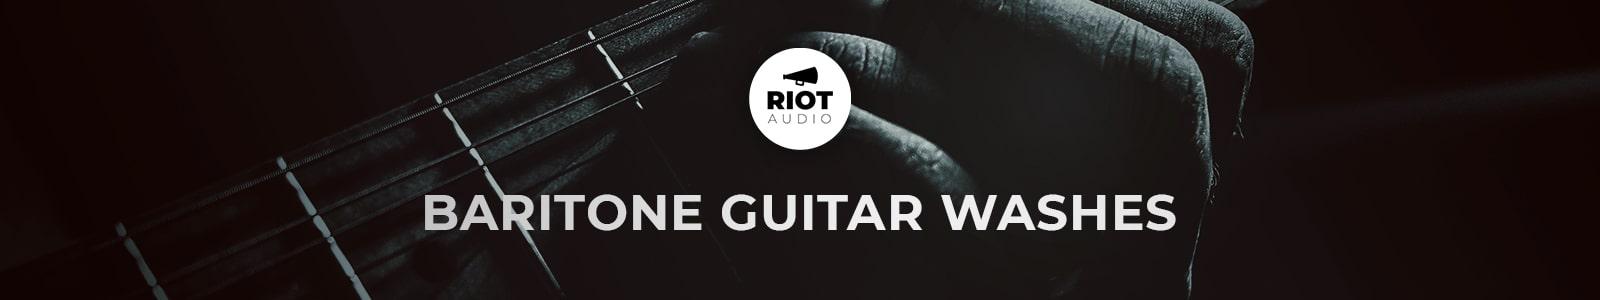 baritone guitar washes